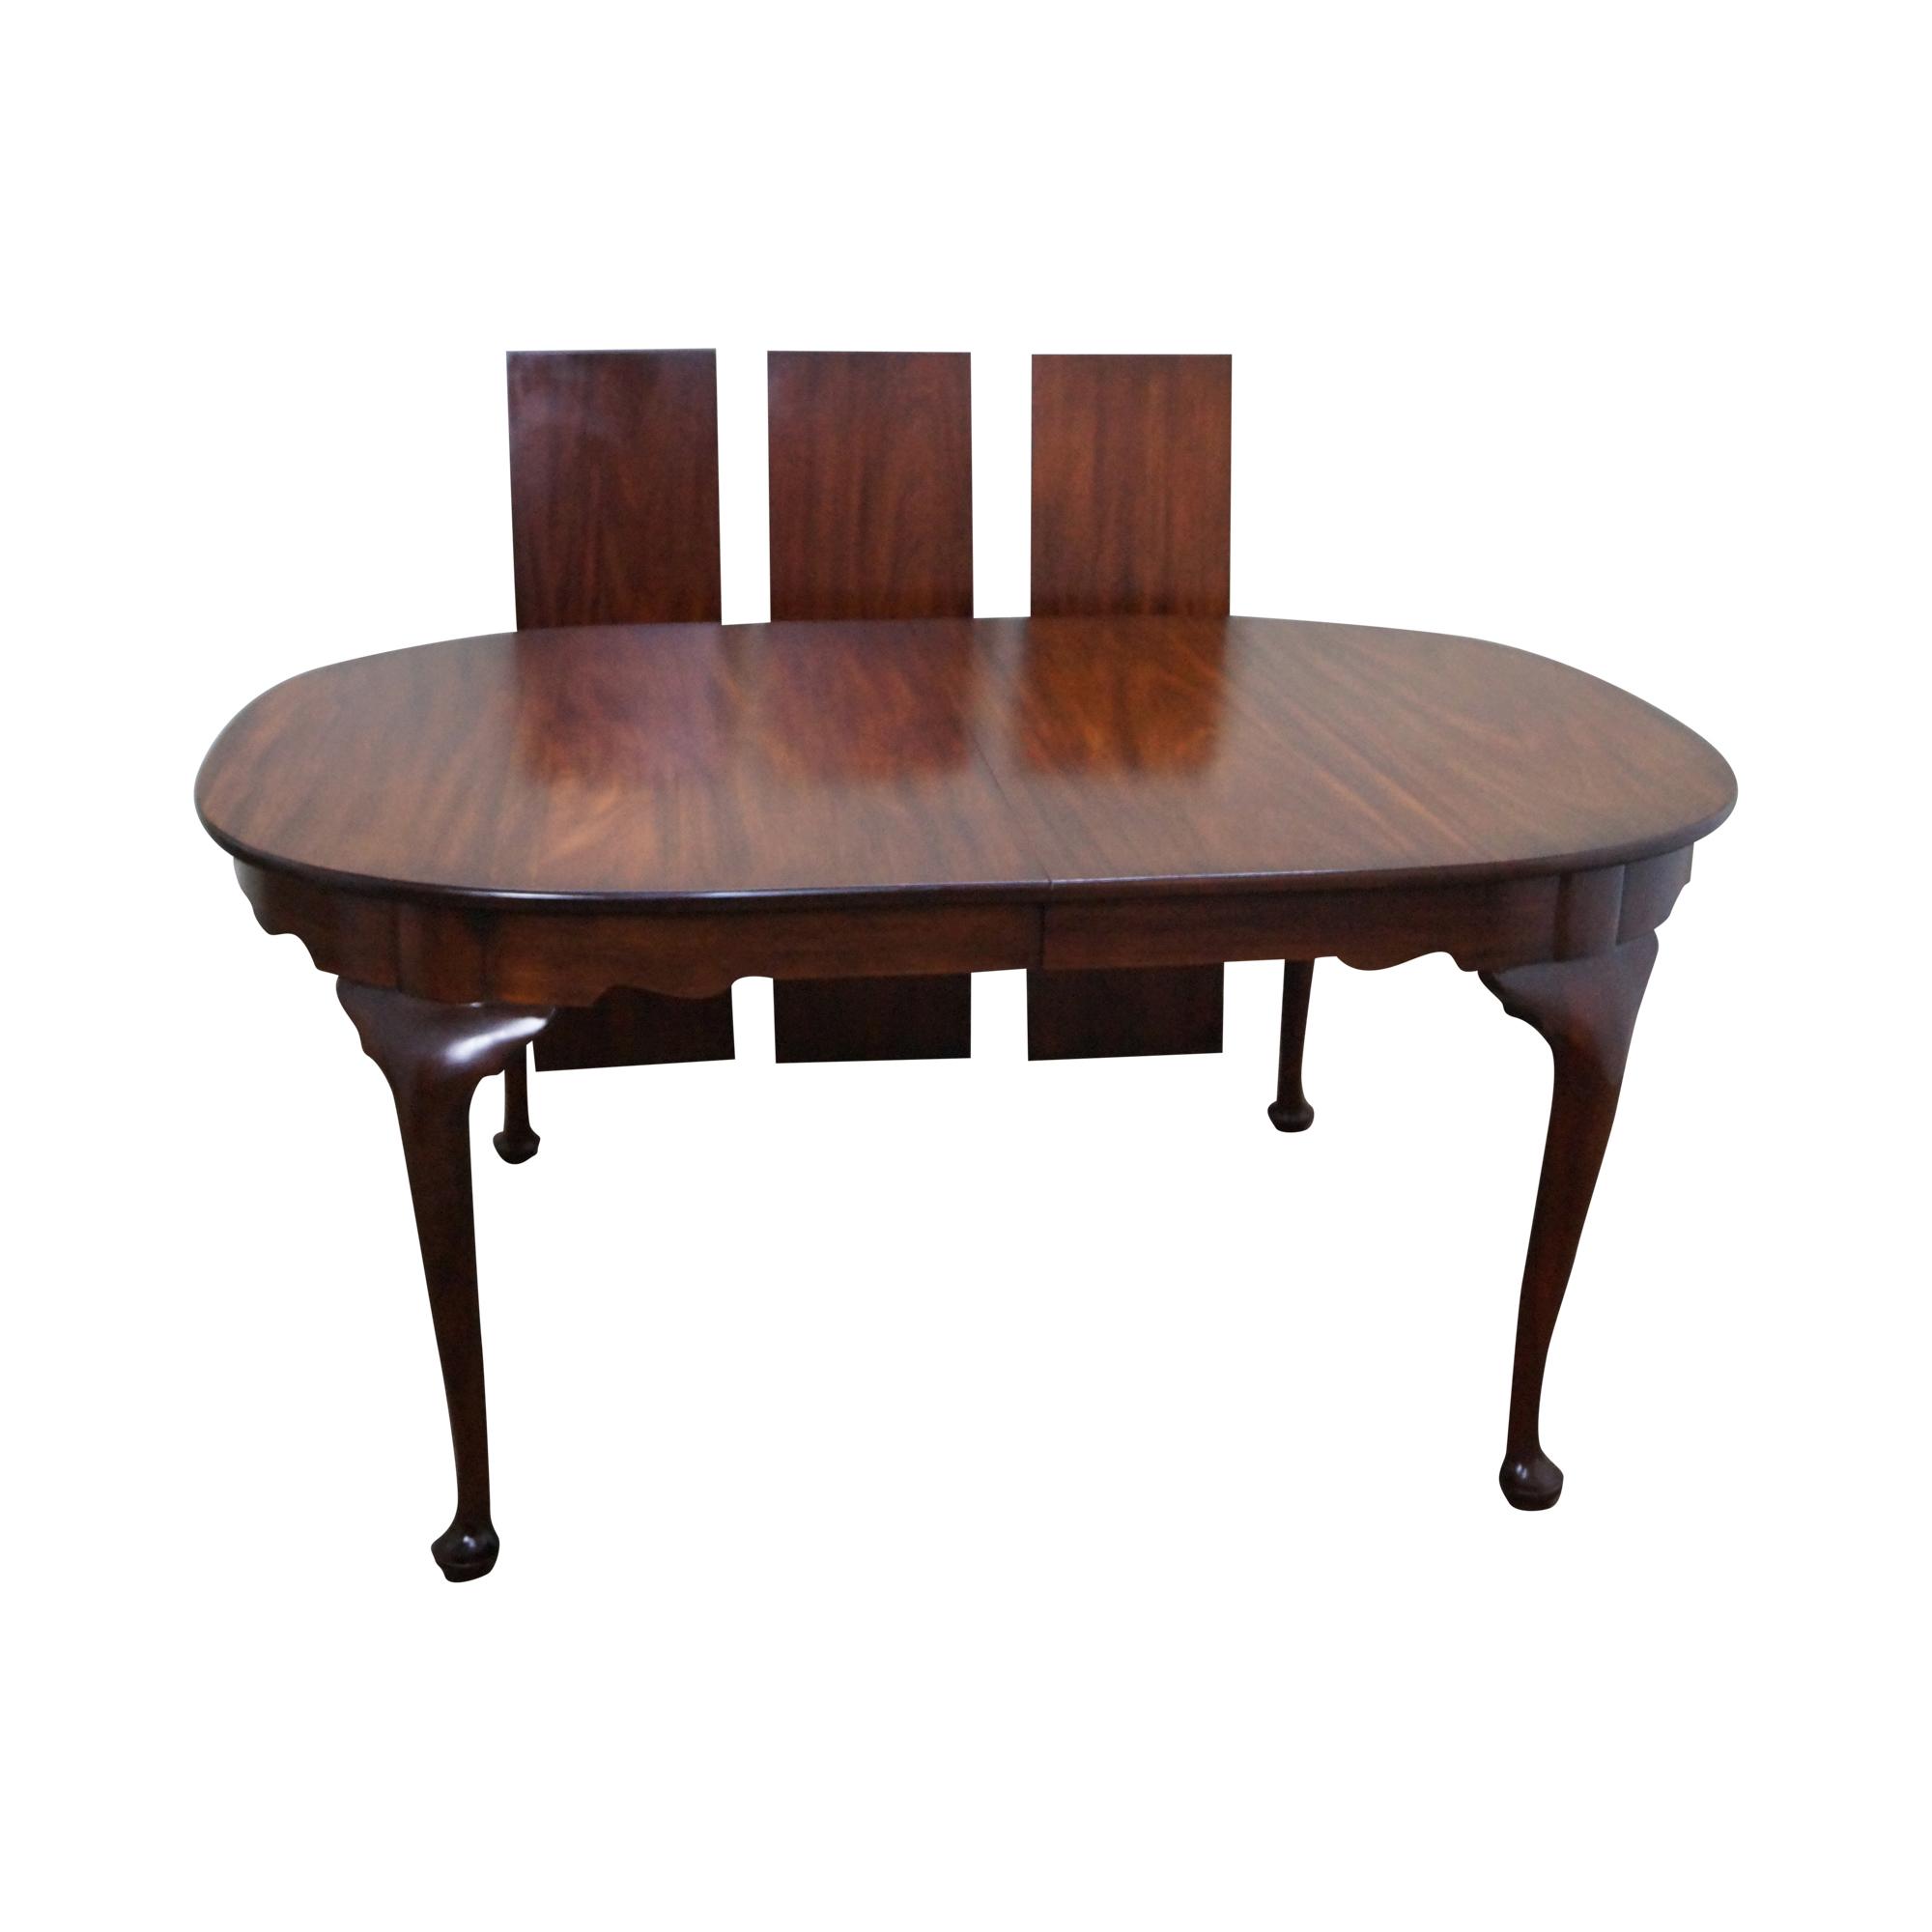 Henkel Harris Queen Anne Mahogany Dining Table Chairish : f0e457e4 0455 43ae 9ea8 f0bebb9d58e4aspectfitampwidth640ampheight640 from www.chairish.com size 640 x 640 jpeg 20kB